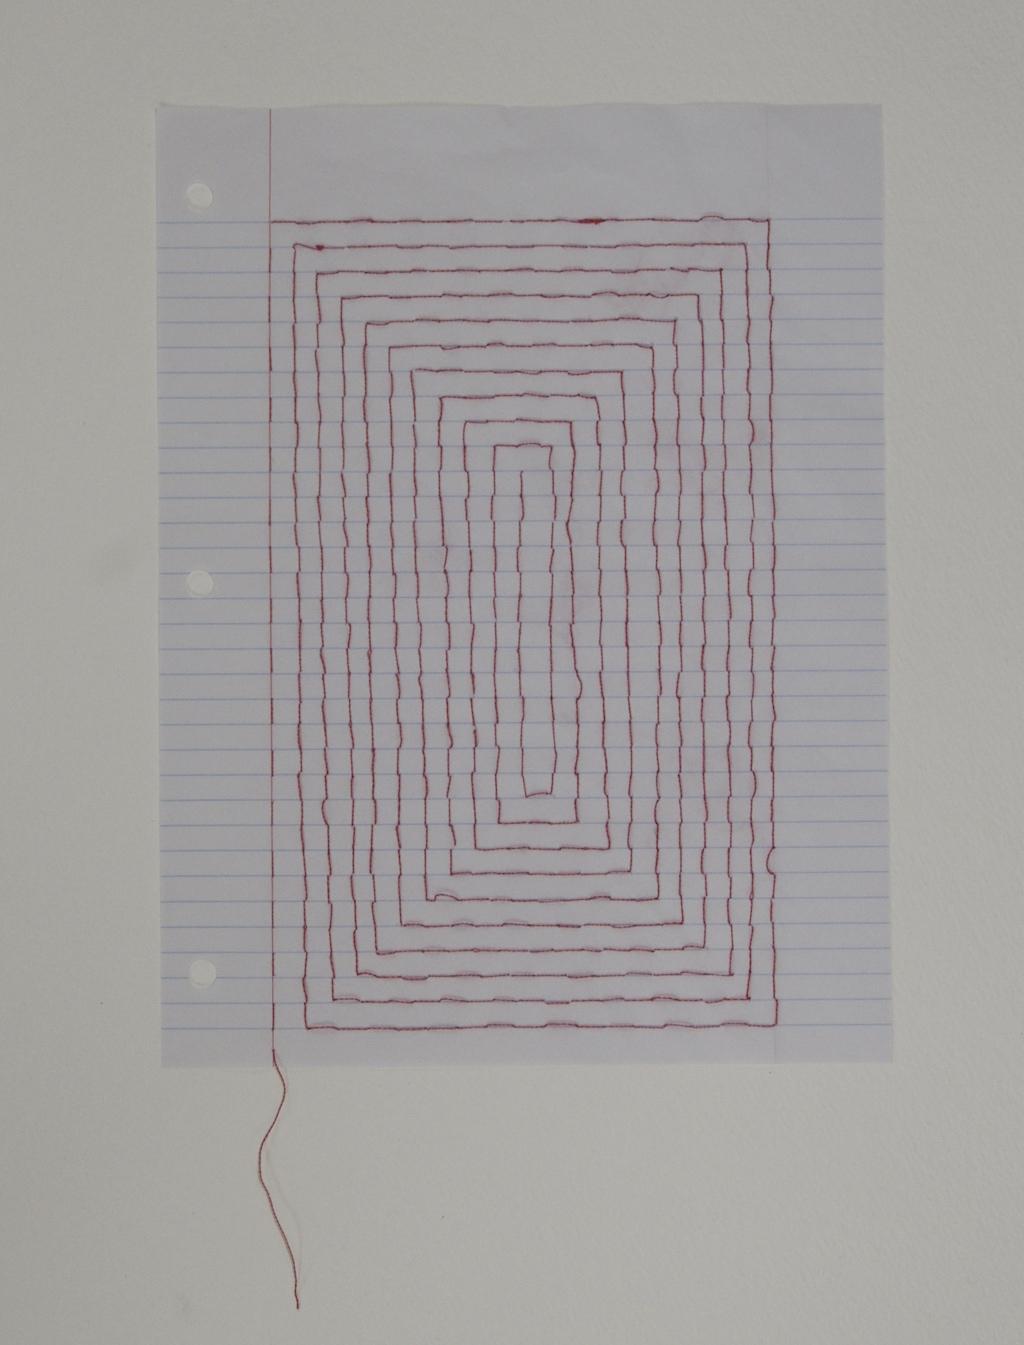 Carpet Page: Labyrinth , 2014, embroidery thread on loose leaf